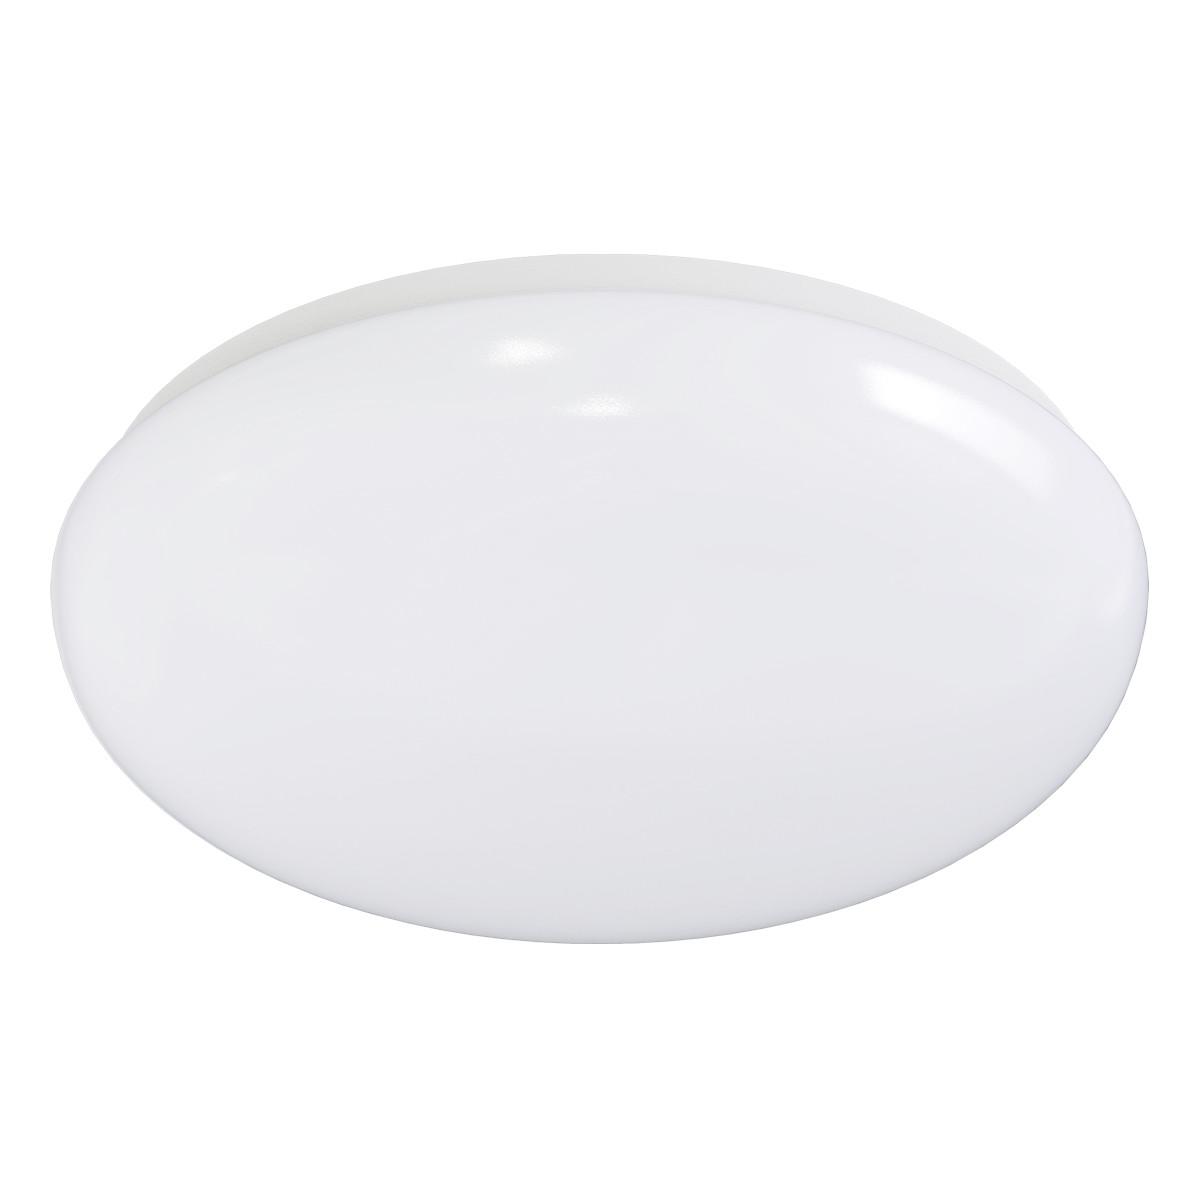 LED Plafondlamp met Bewegingssensor - Aigi - Opbouw Rond 24W - Helder/Koud Wit 6500K - 360° - Mat Wi